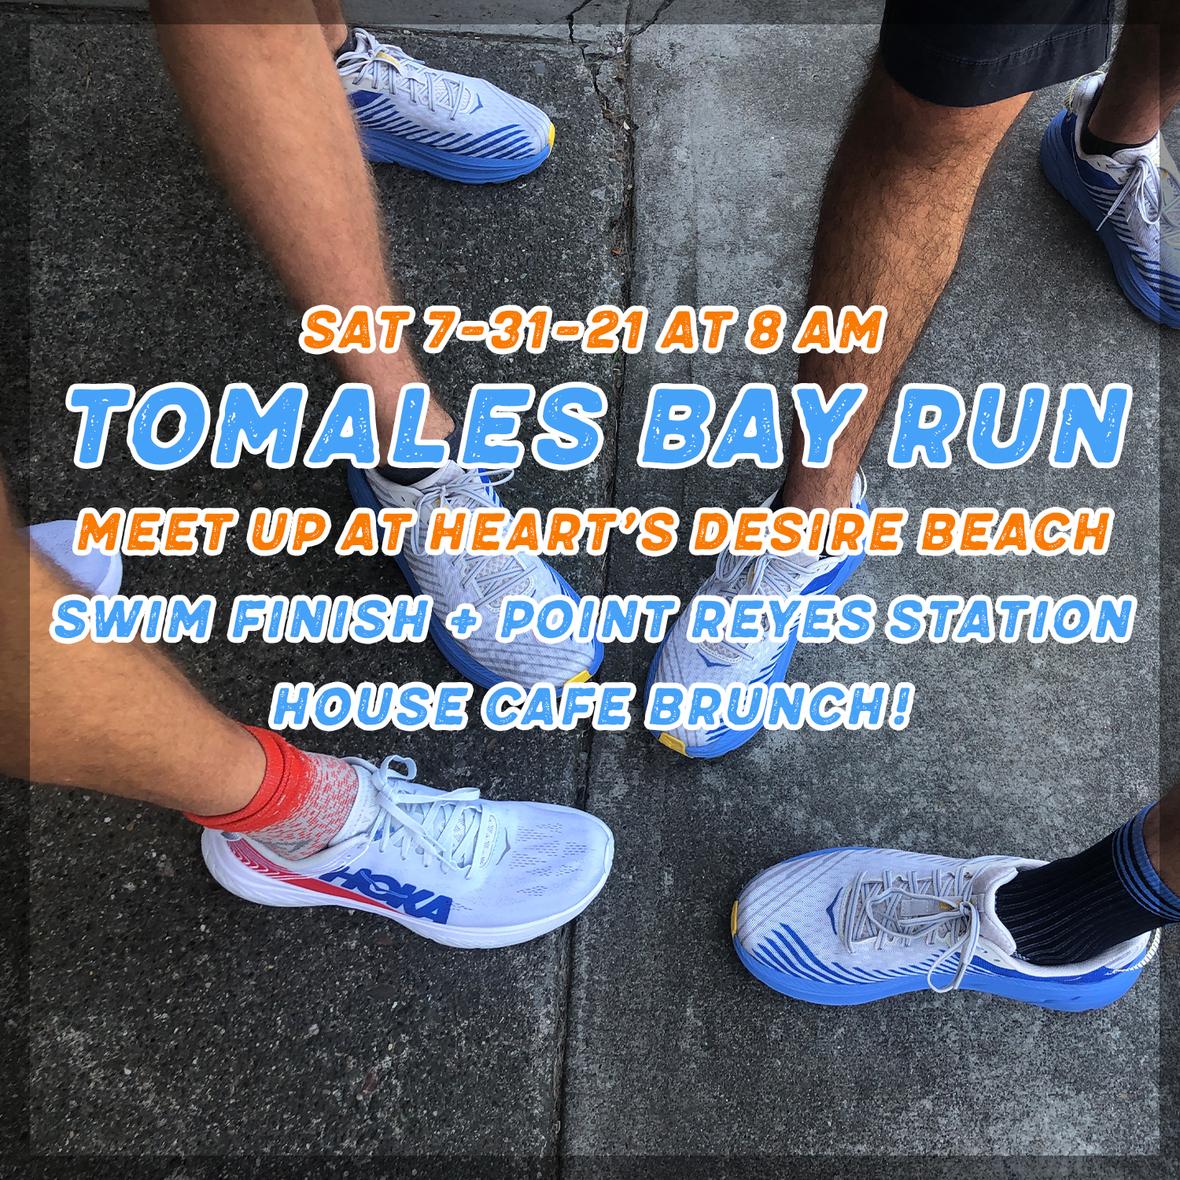 tamales bay